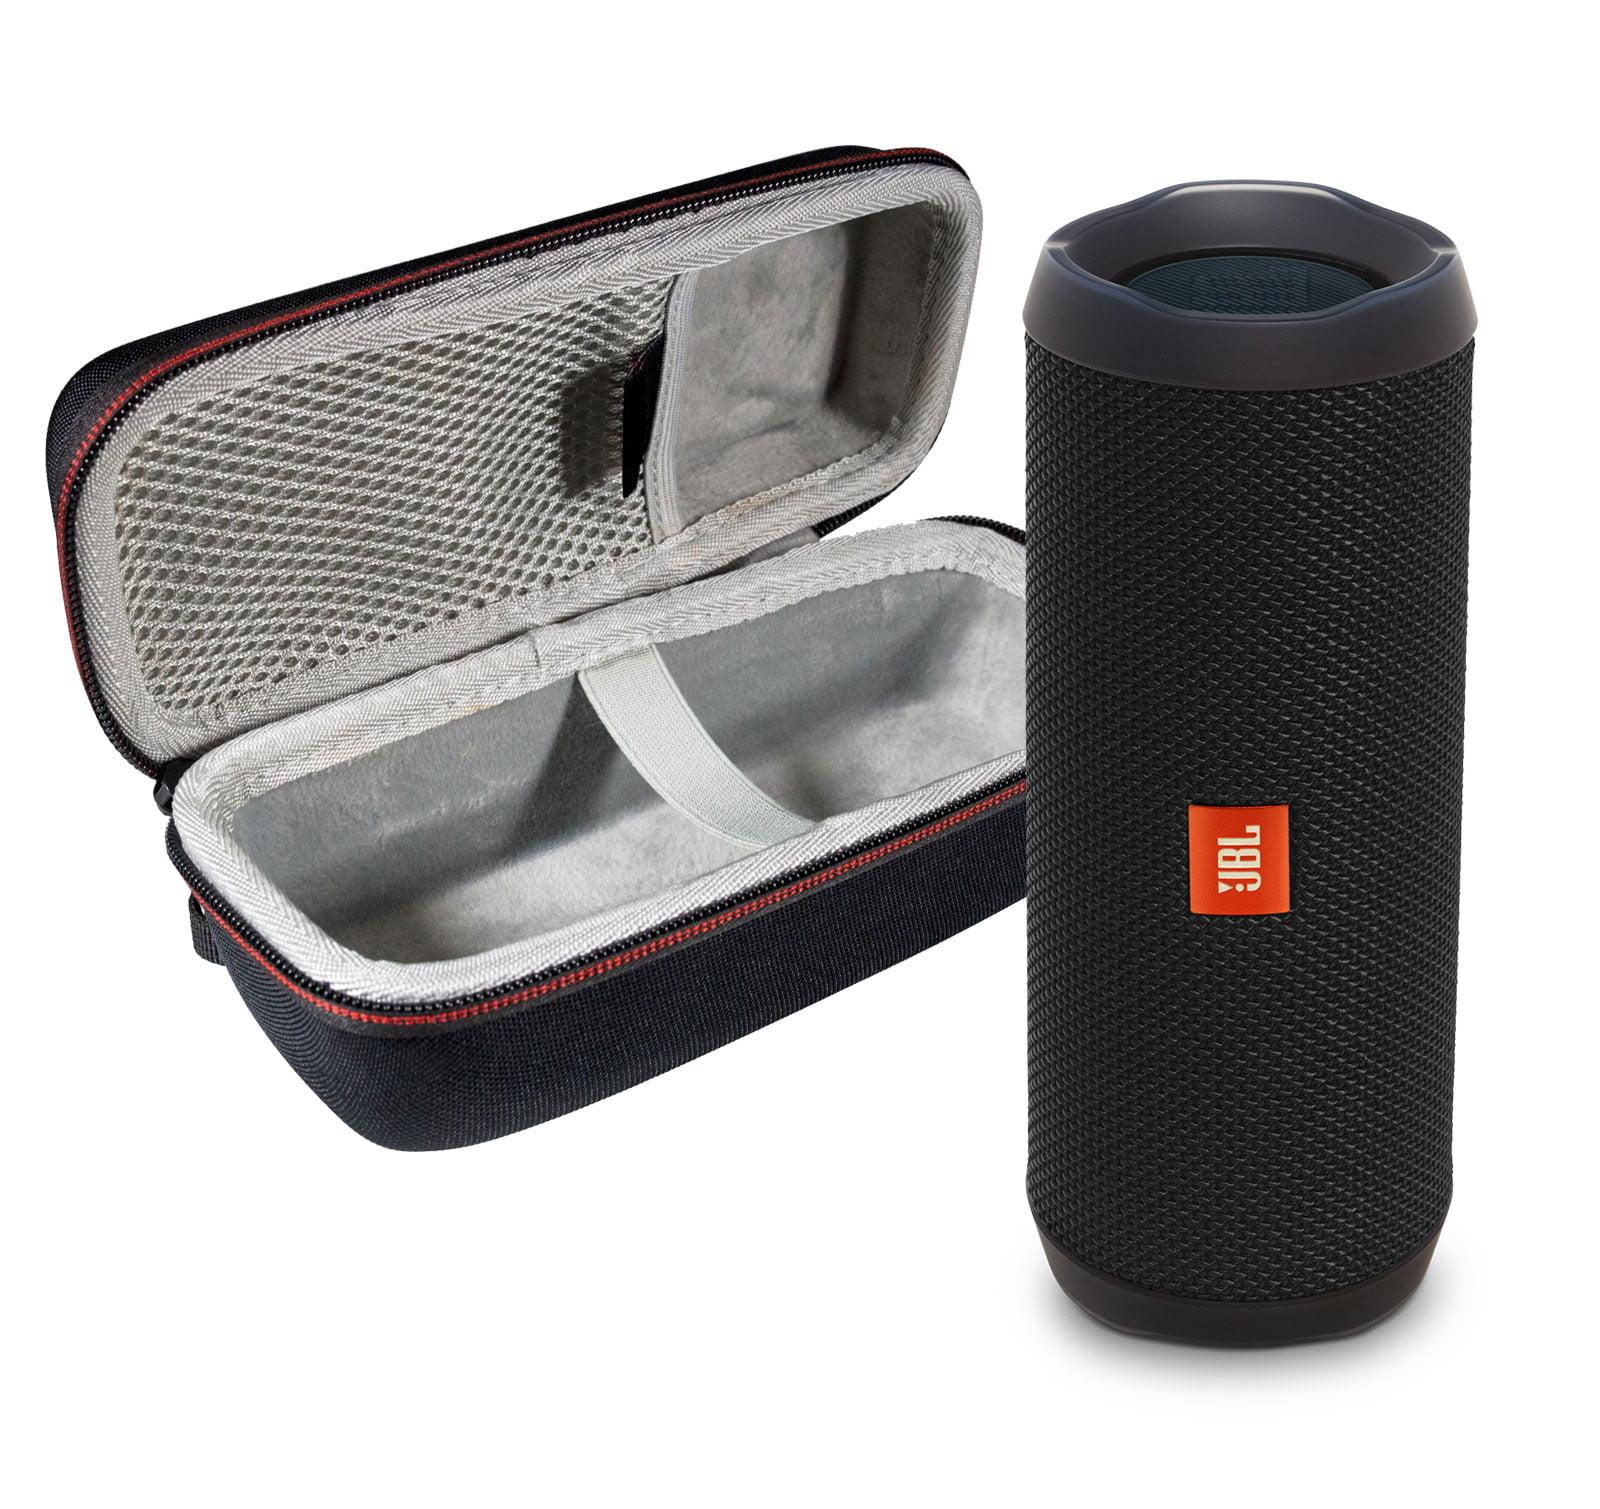 jbl flip 4 black kit bluetooth speaker & portable